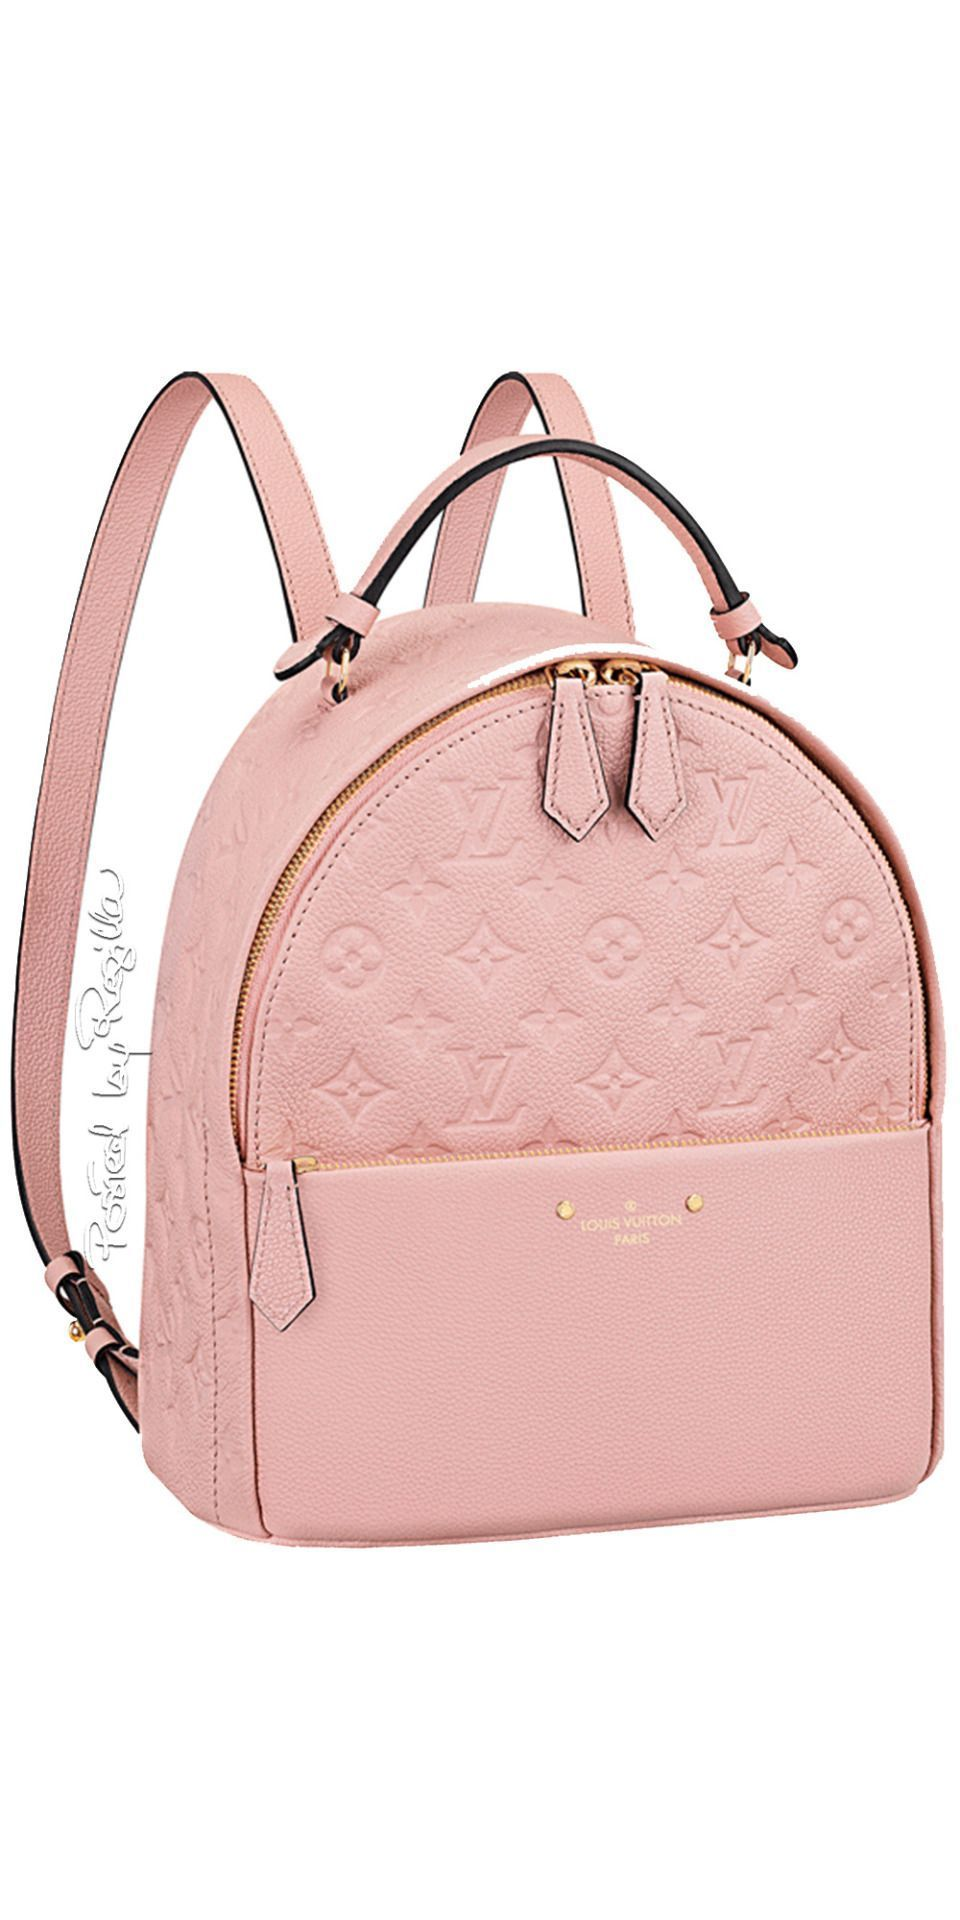 17a671ab4e3 LIGHT PINK LOUIS Back pack BAG!!!  coach  louisvuitton  gucci  pink  bag   purse  louisvuittonhandbags  aesthetic